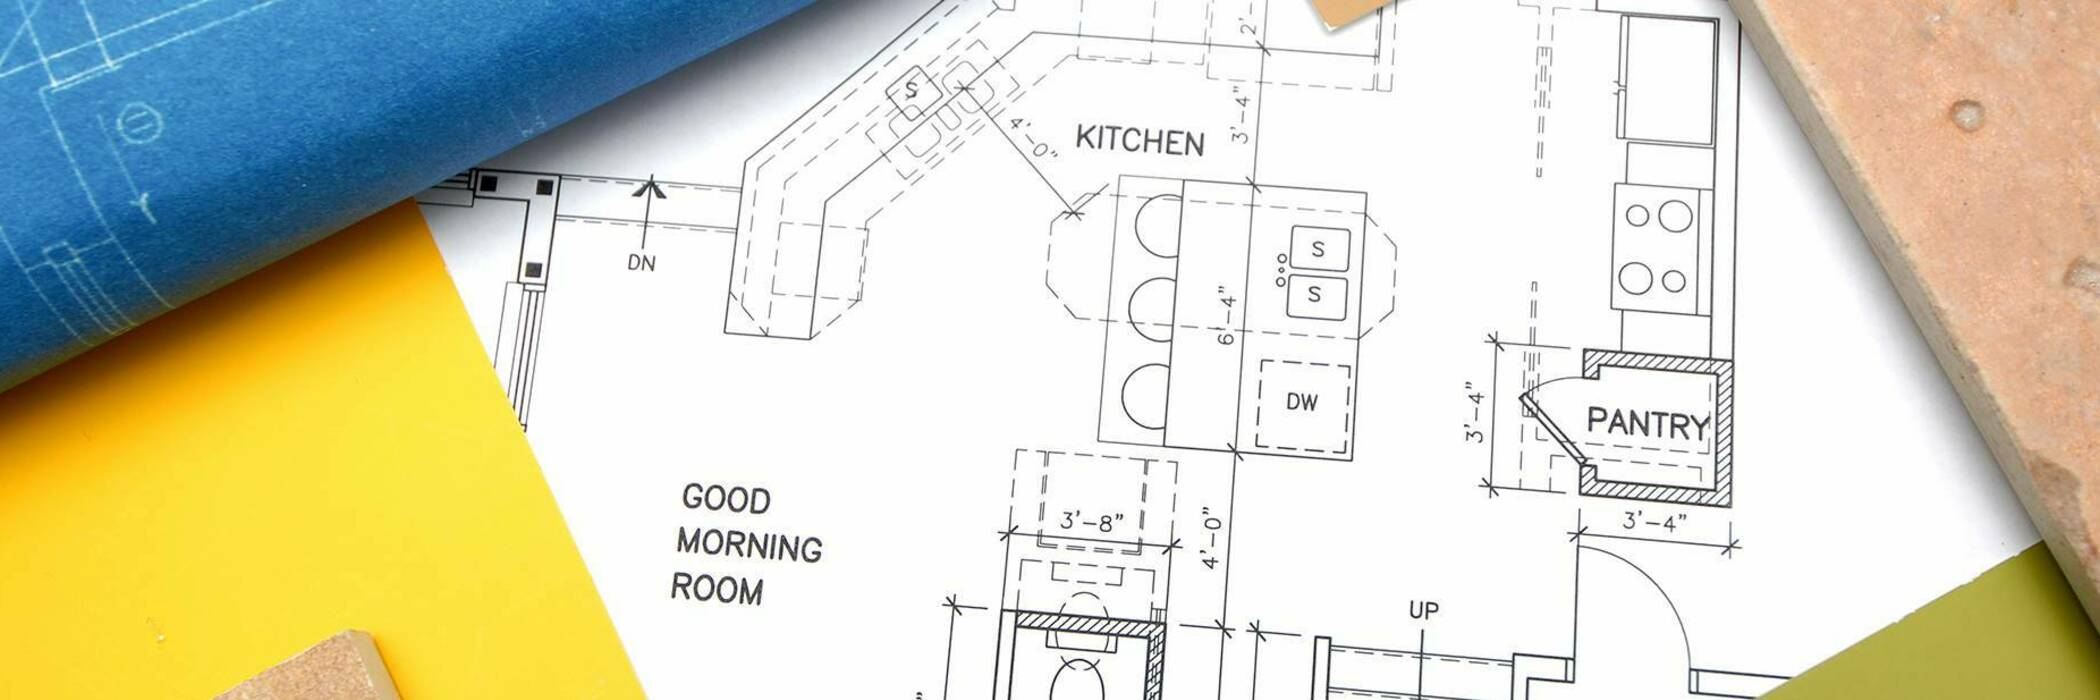 Renovation planning and designs hero